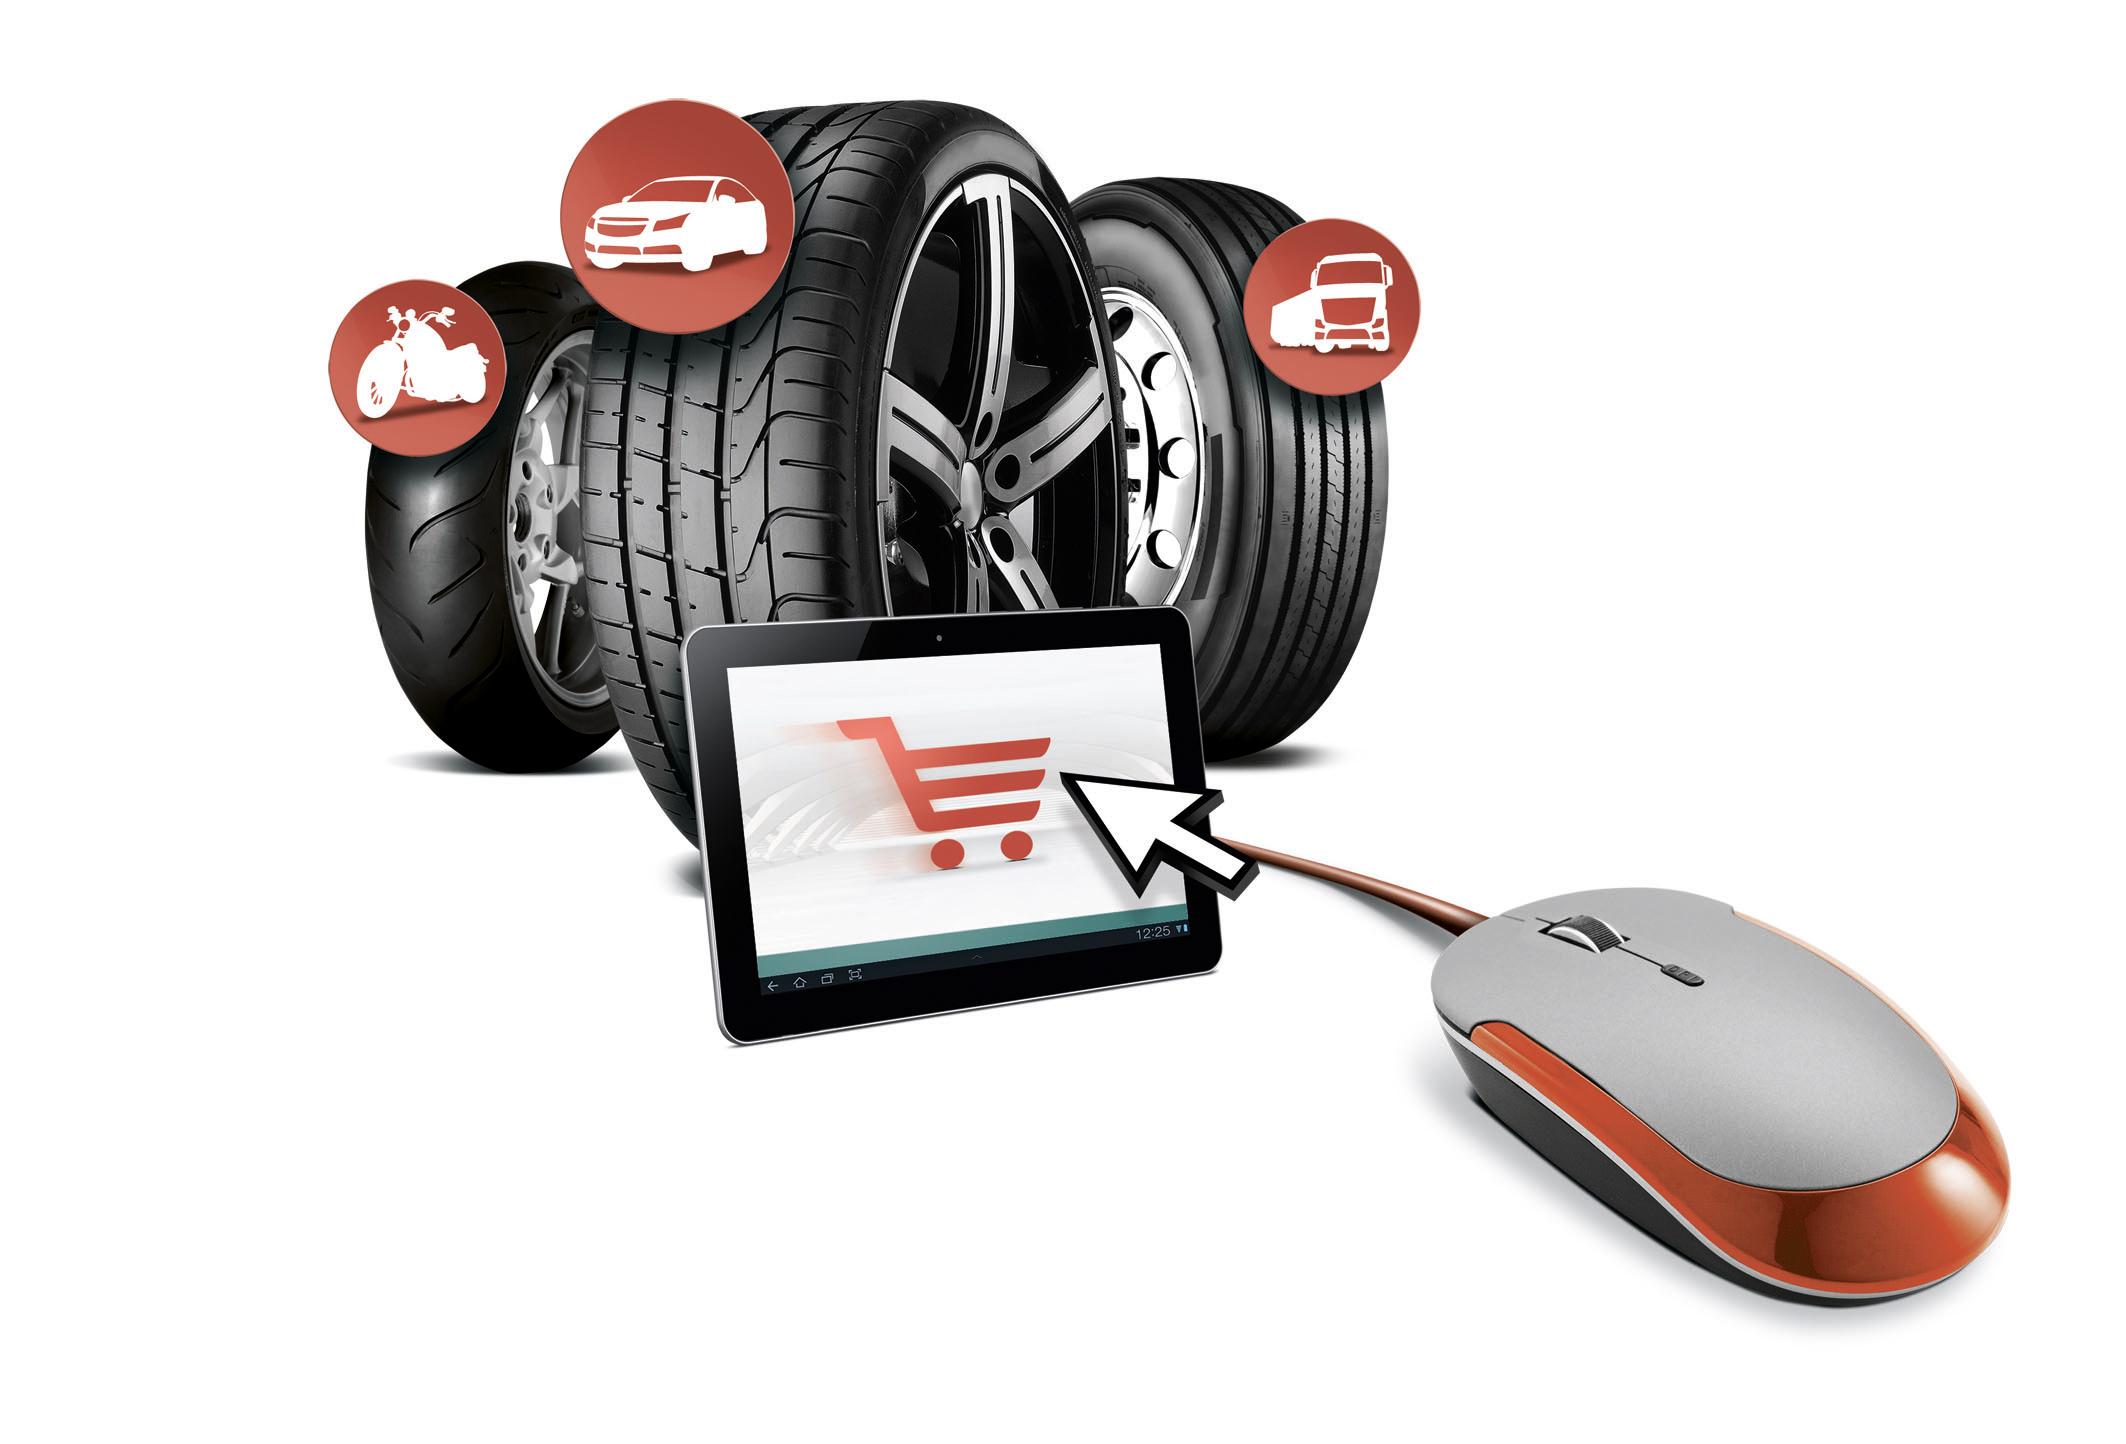 Neumaticos123.com ahora con diseño web responsivo (Photo: Business Wire)